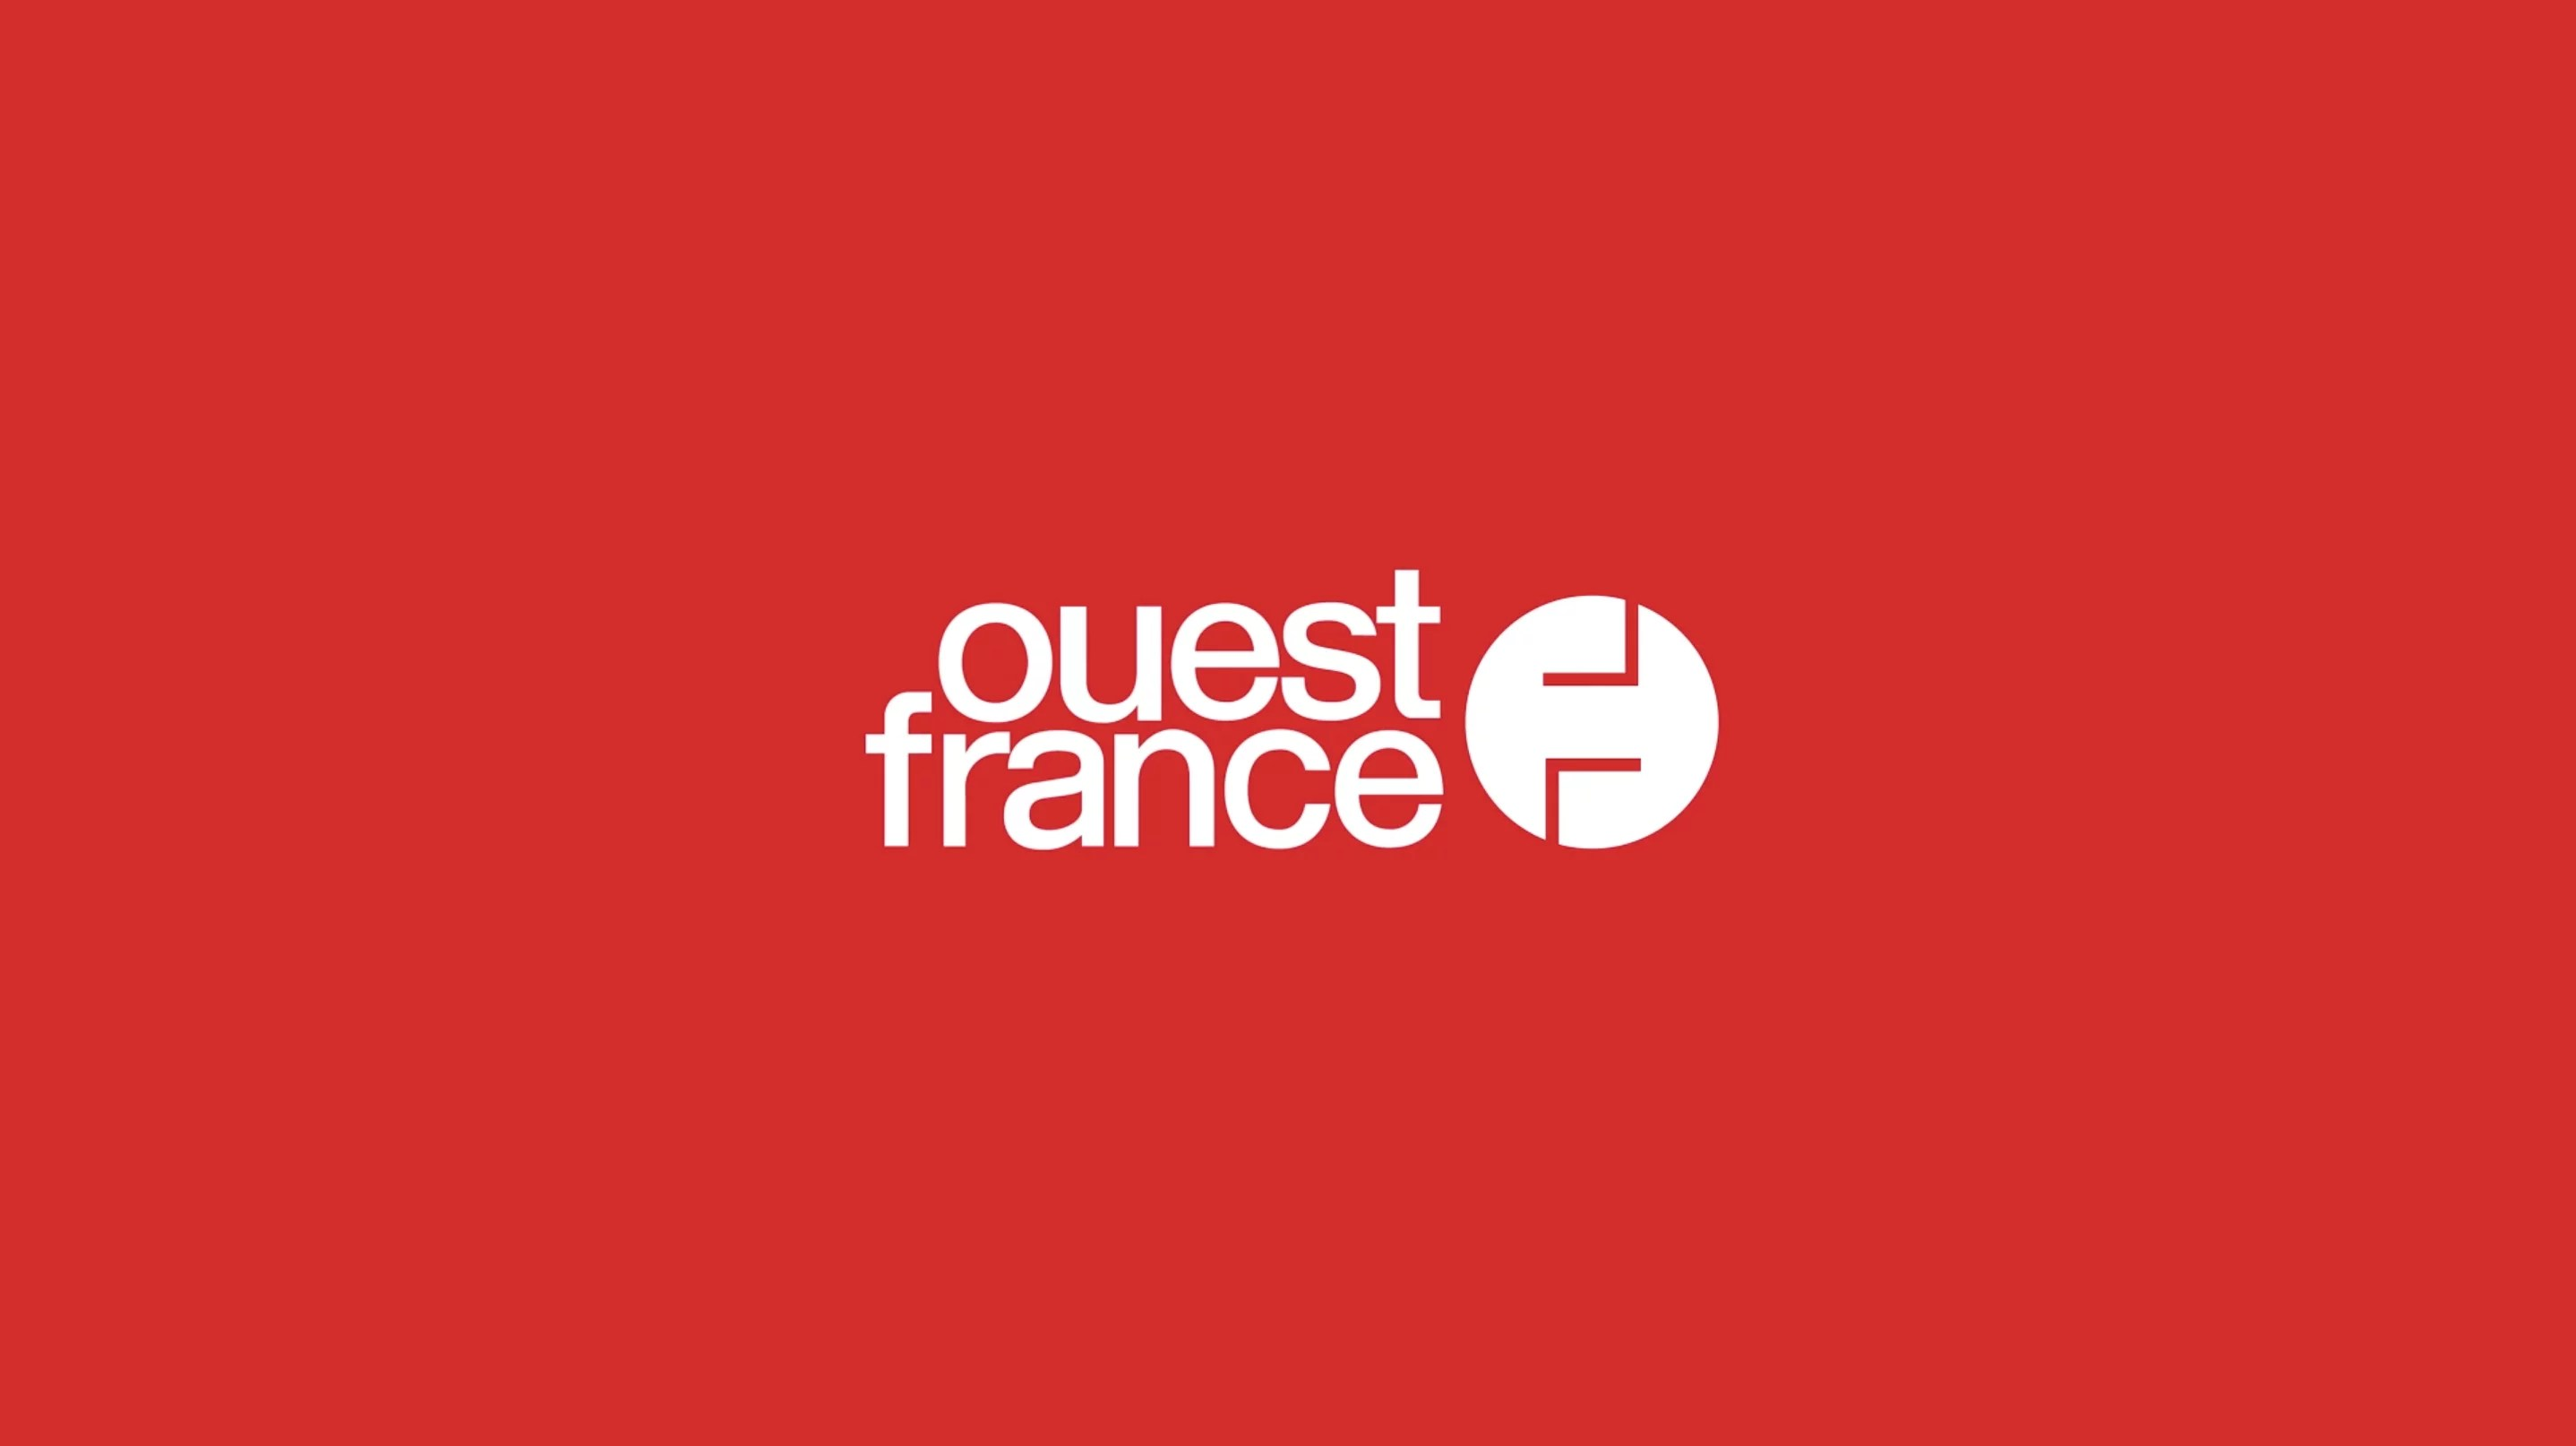 Ouest France_Rebranding Video_Mstream